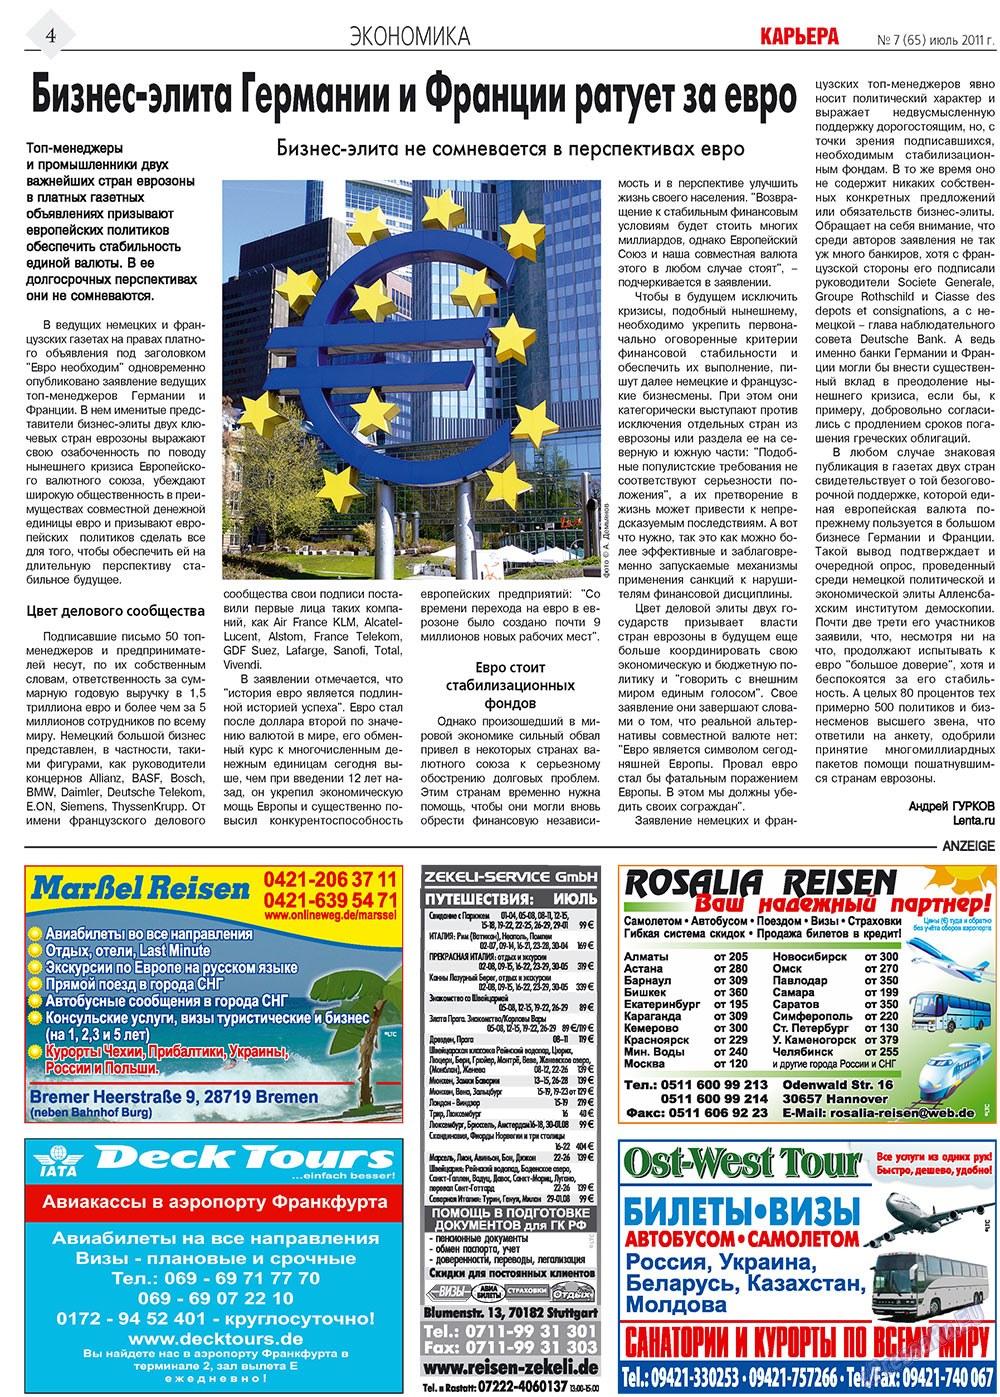 Карьера (газета). 2011 год, номер 7, стр. 4